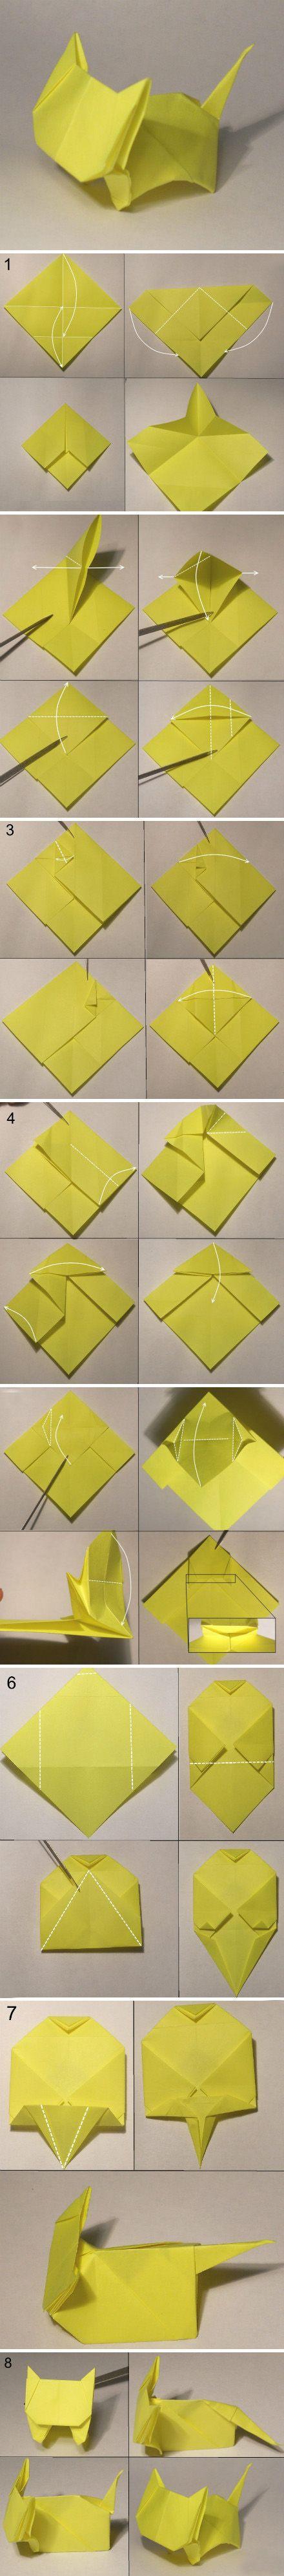 Simple origami kitten paper craft